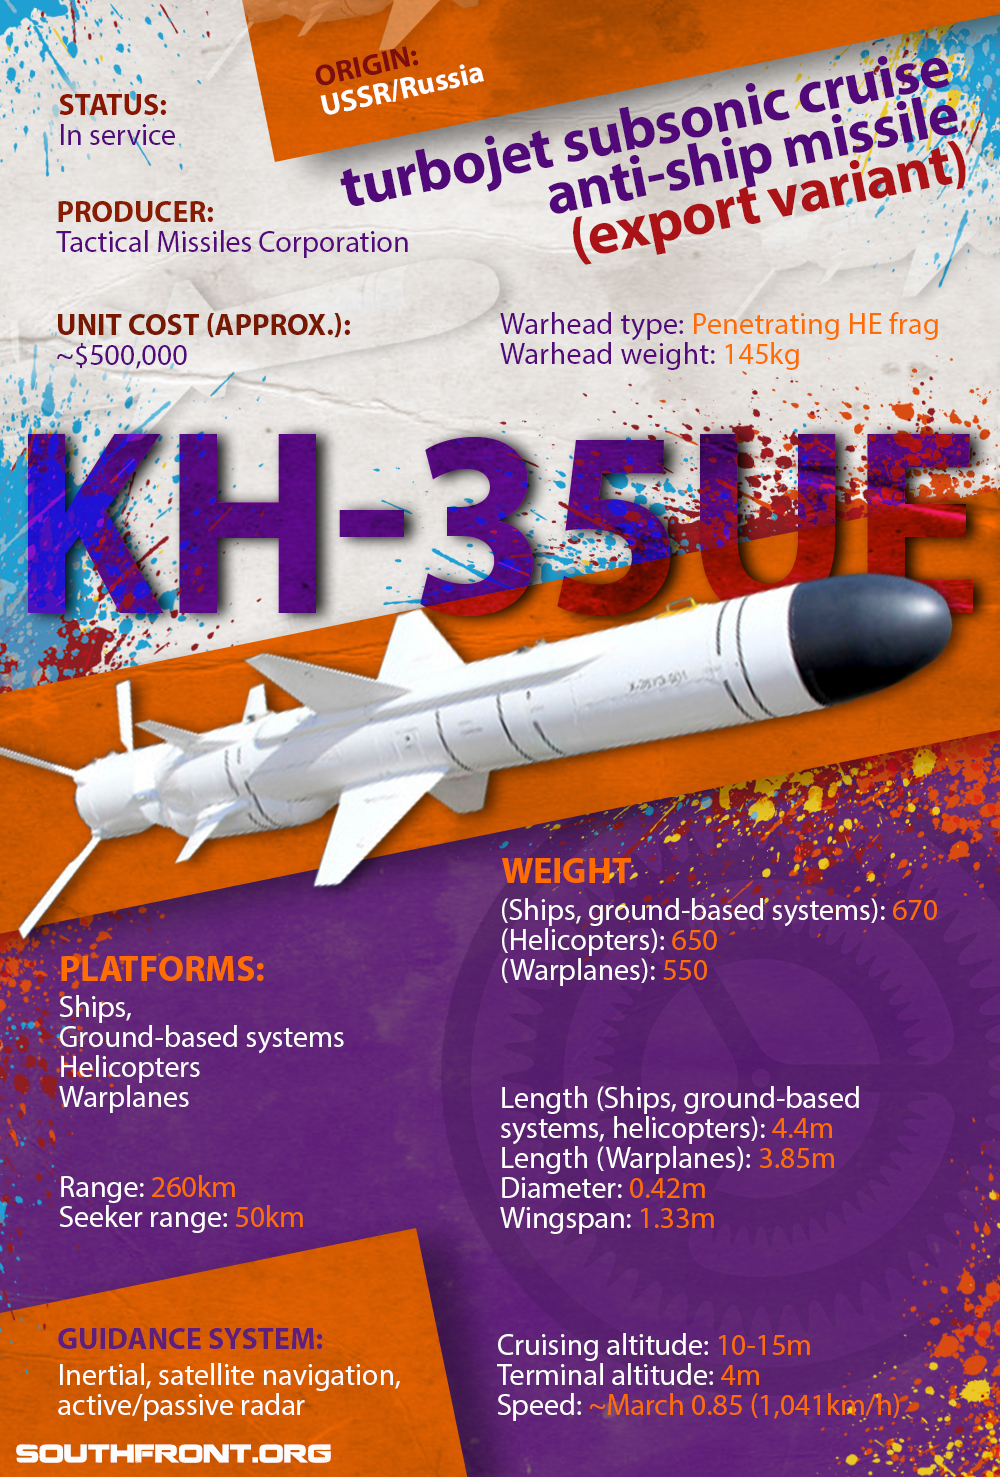 Kh-35UE Turbojet Subsonic Cruise Anti-Ship Missile (Infographics)